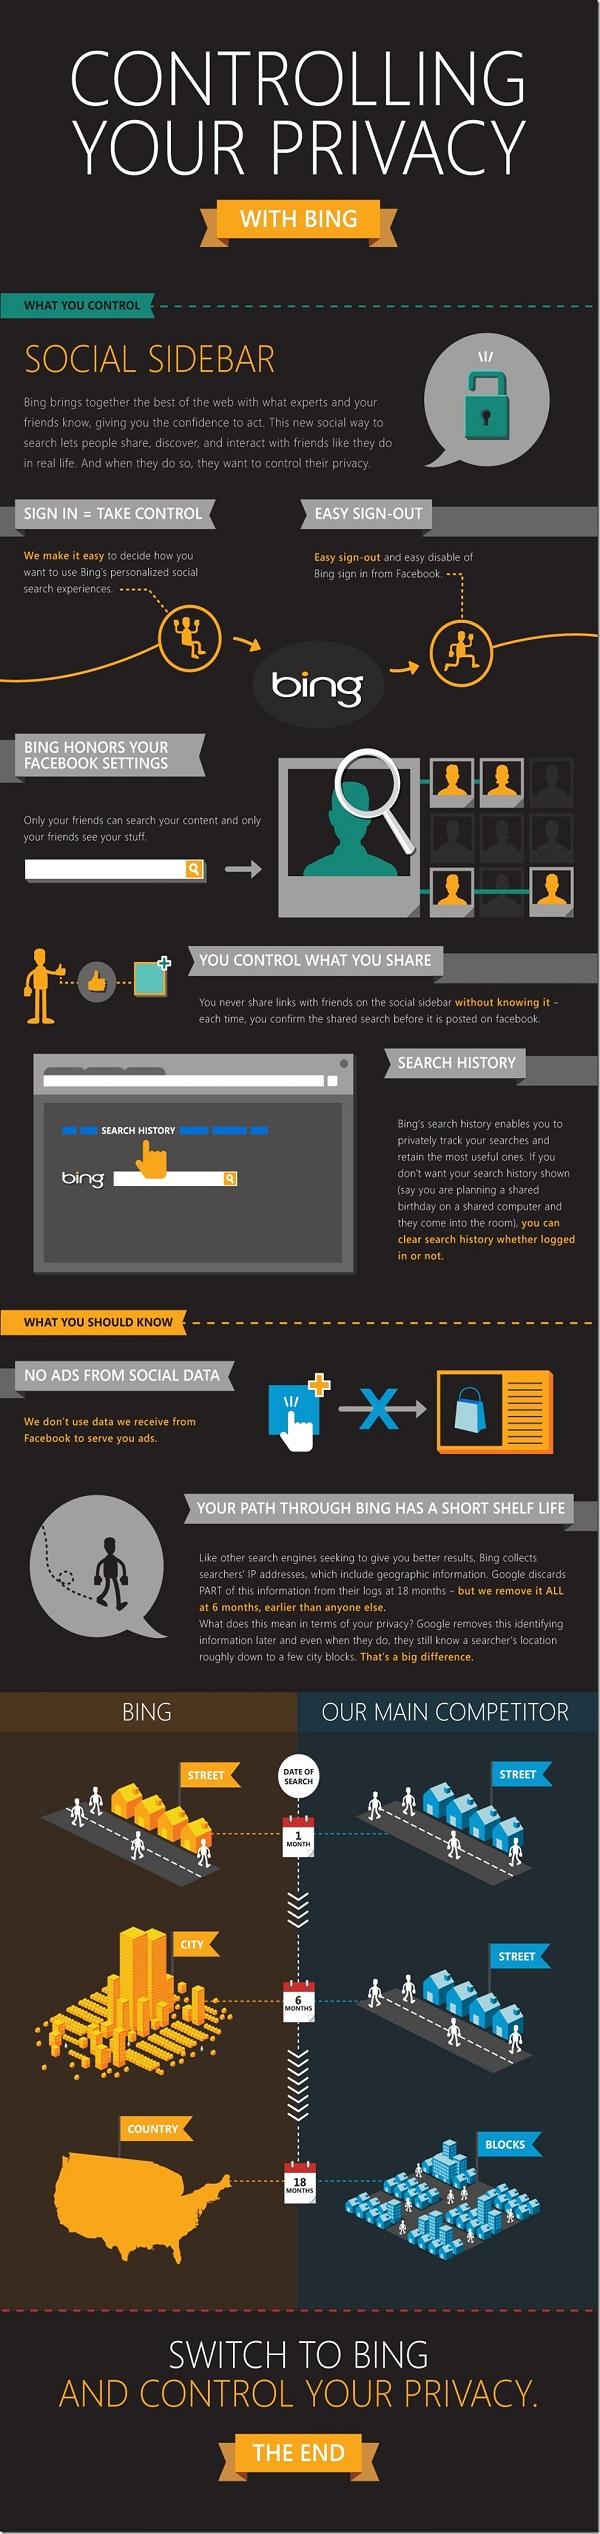 microsoft_bing_infographic